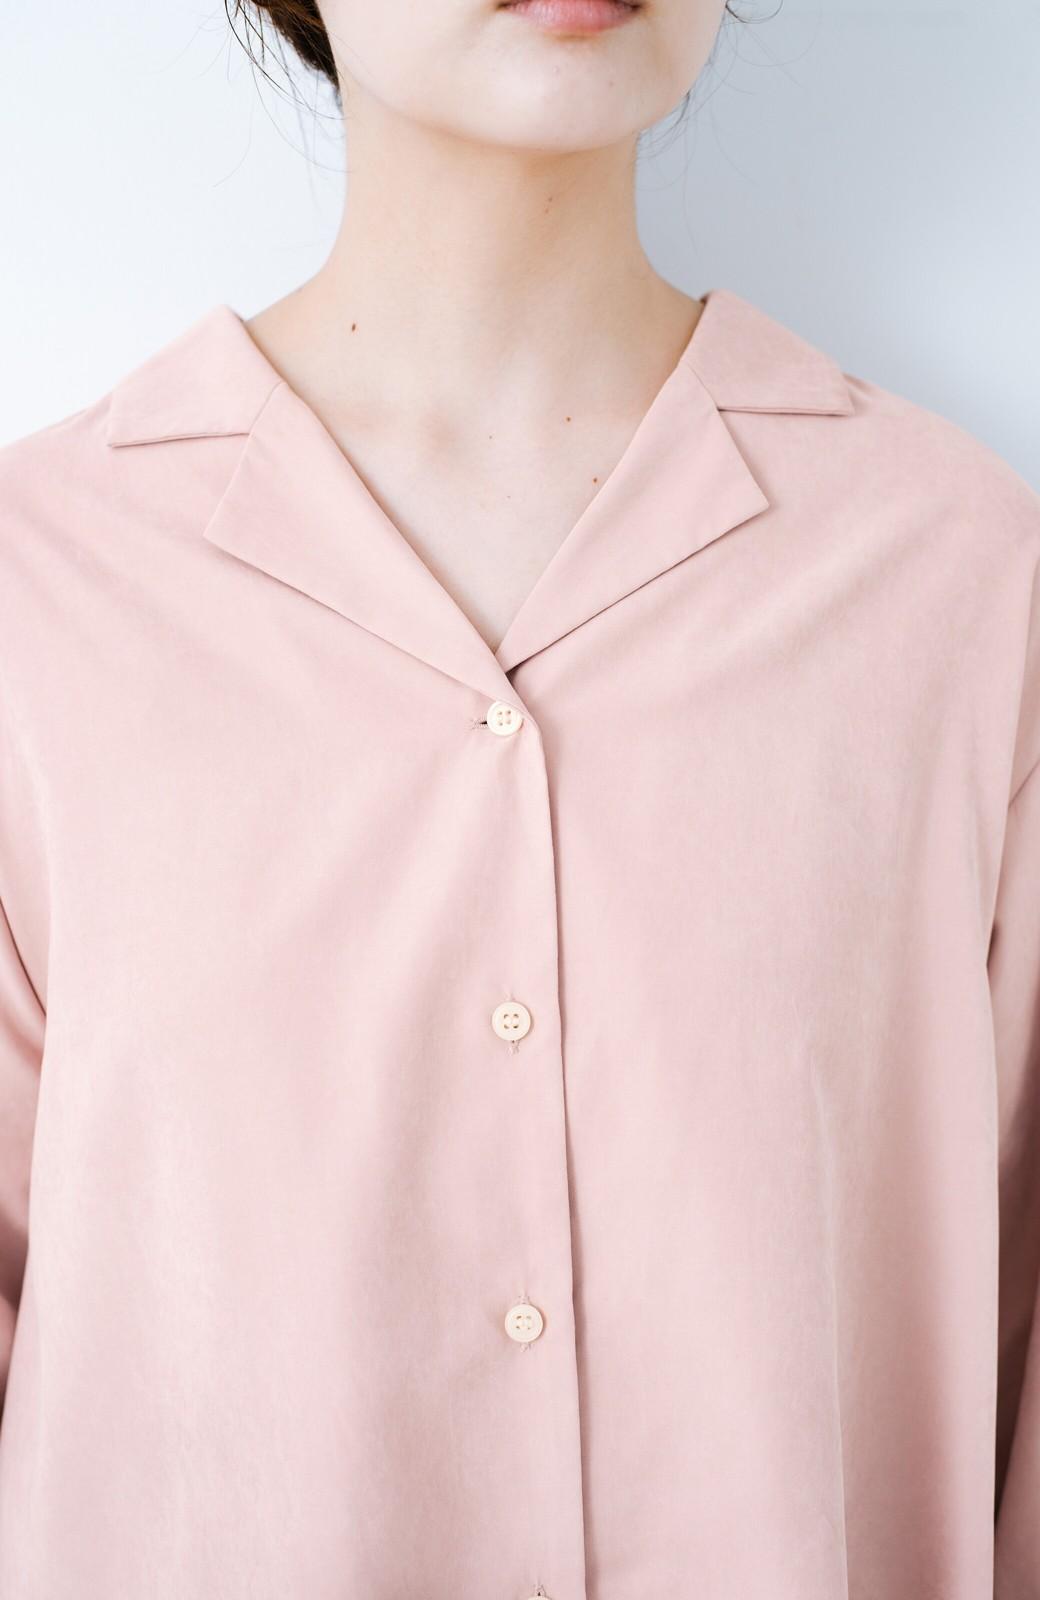 haco! 太ってもばれずに羽織っても便利なAラインワンピース <ピンク>の商品写真5